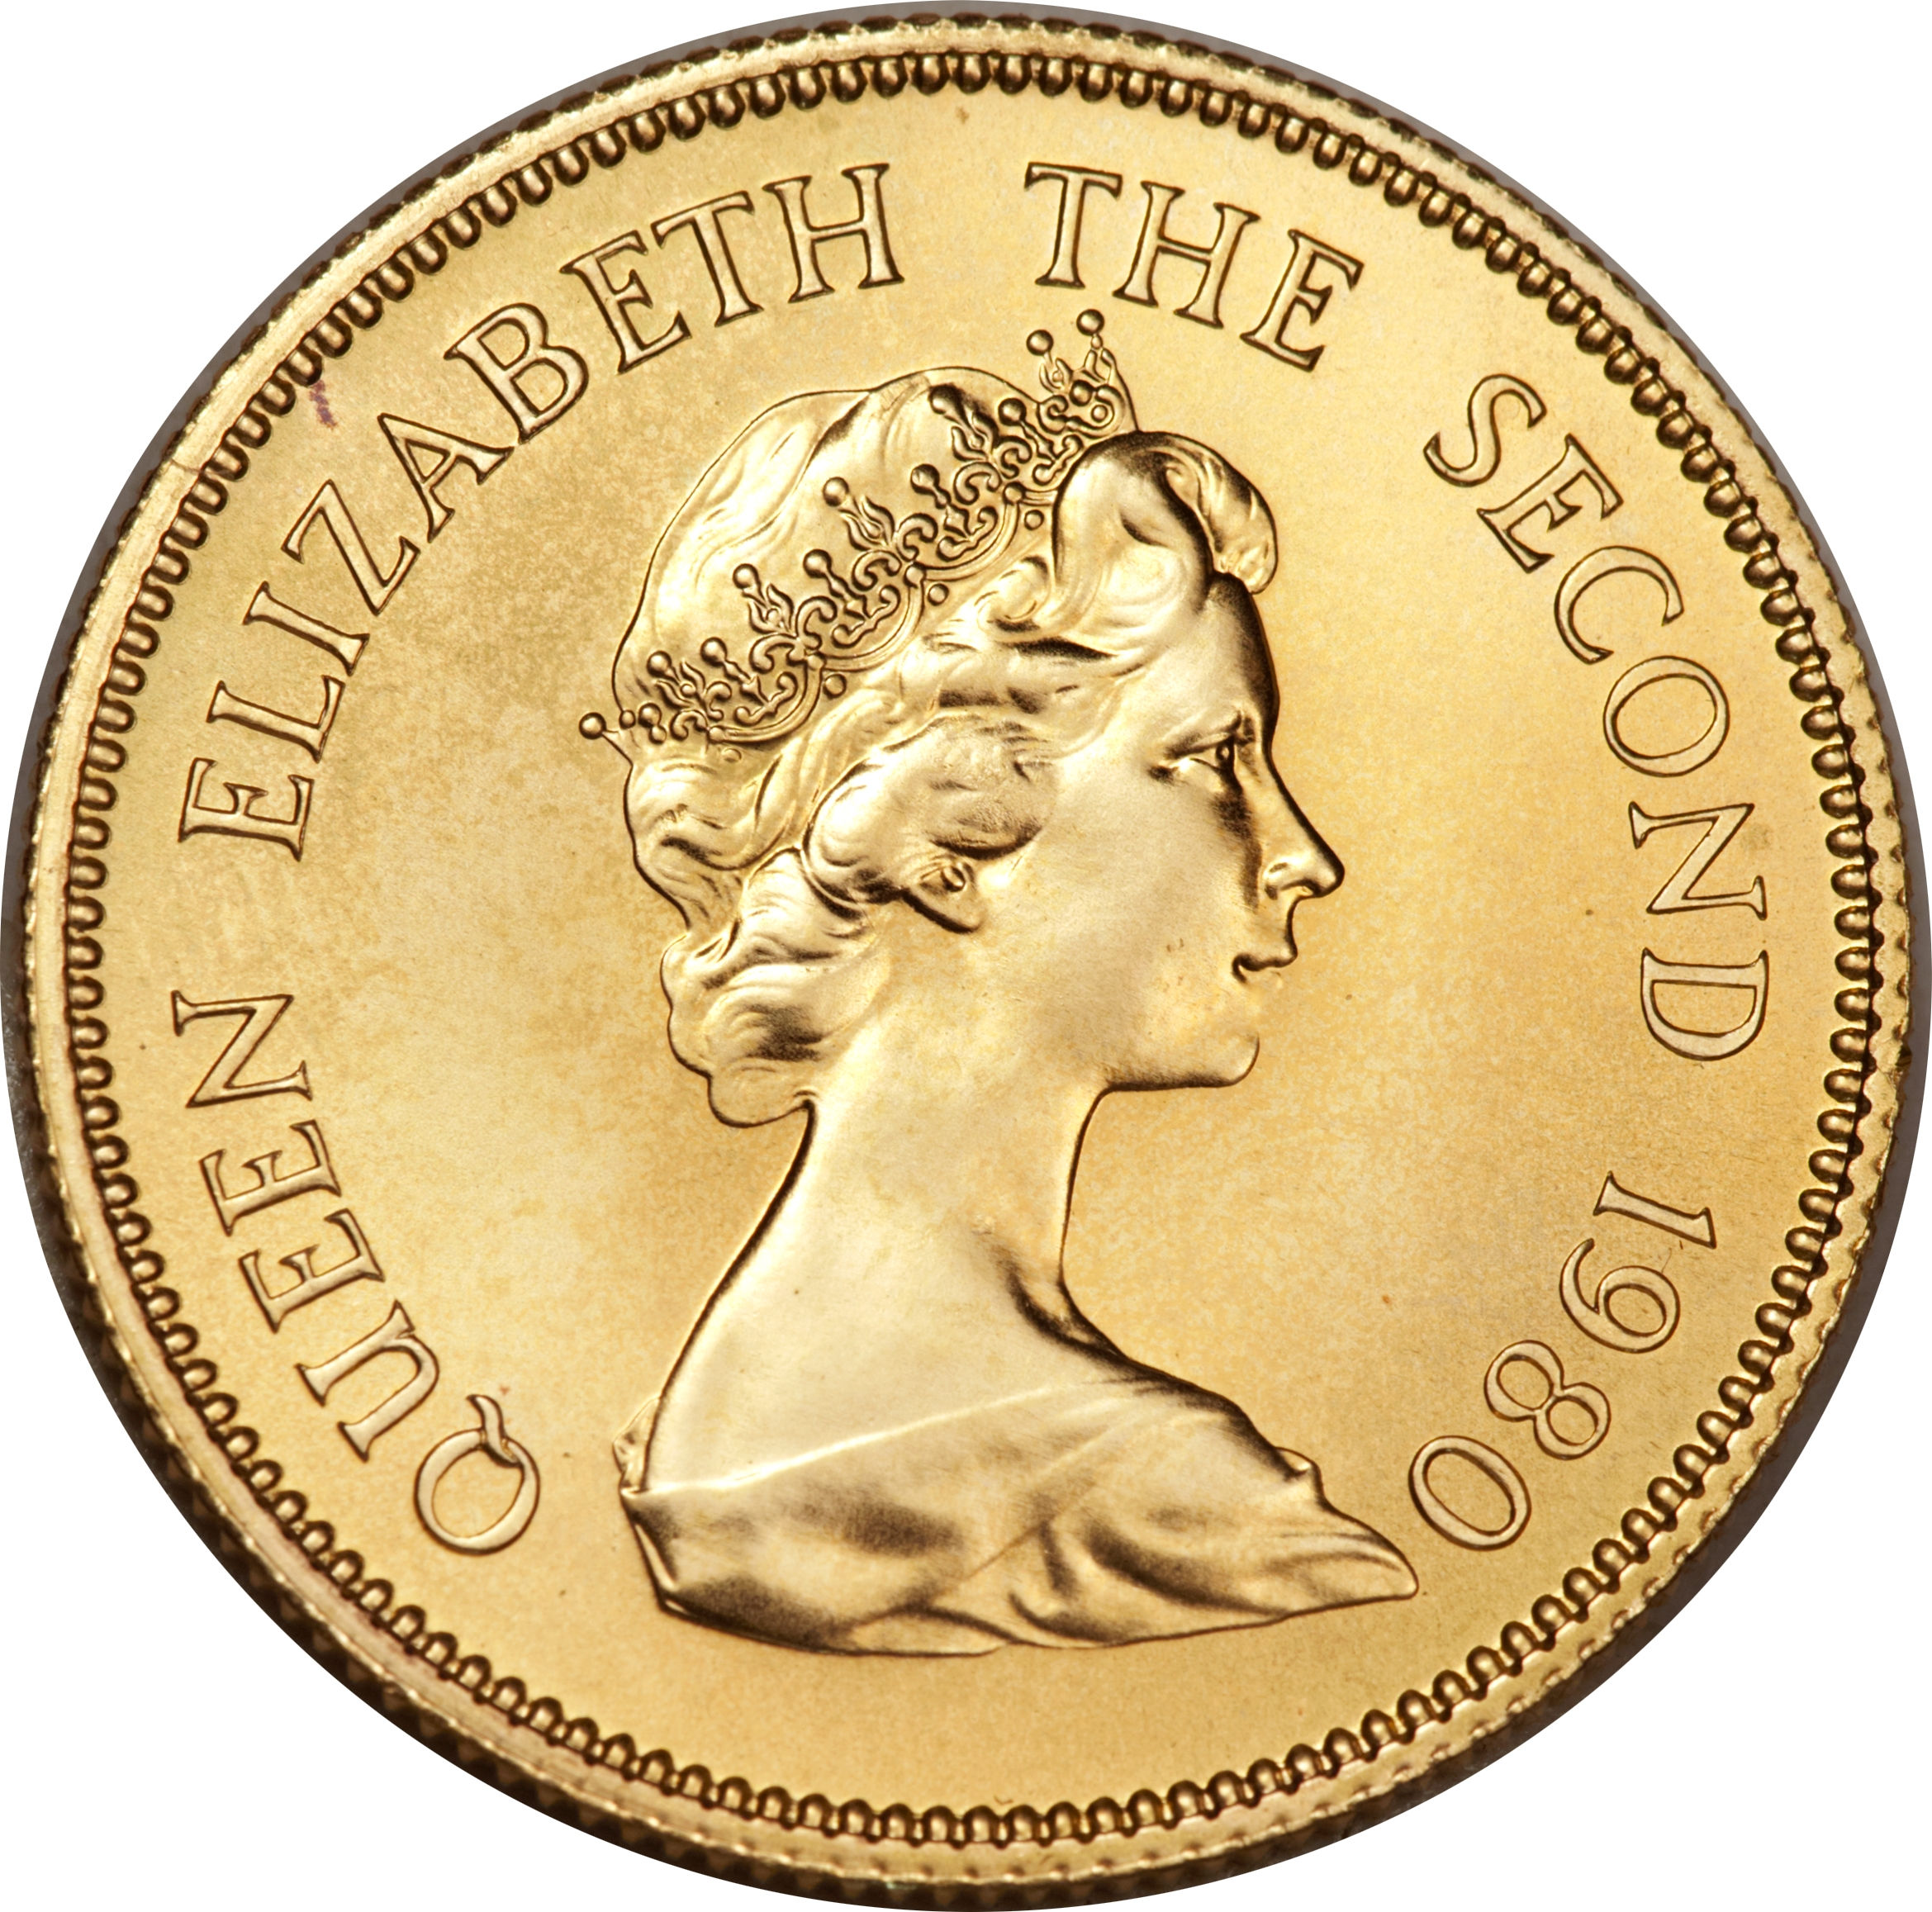 Queen elizabeth the second coin 1980 / Octanox coin 2018